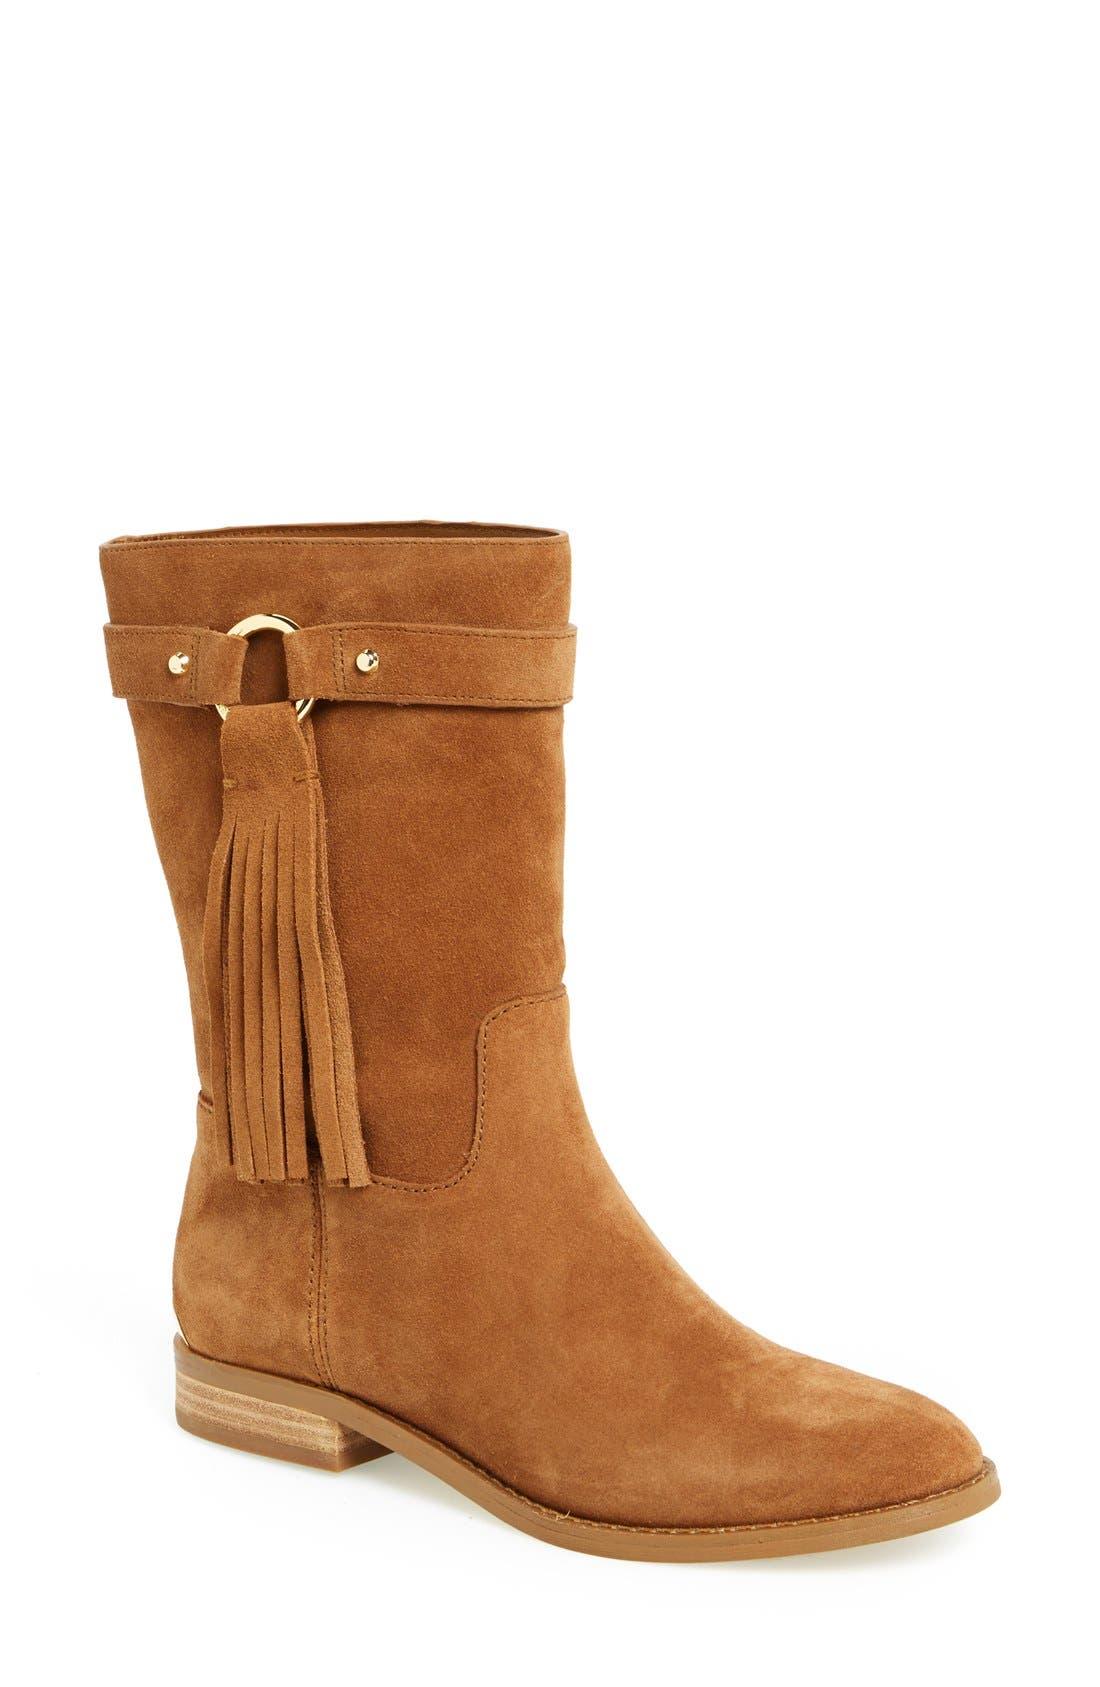 Alternate Image 1 Selected - MICHAEL Michael Kors 'Rhea' Suede Boot (Women)